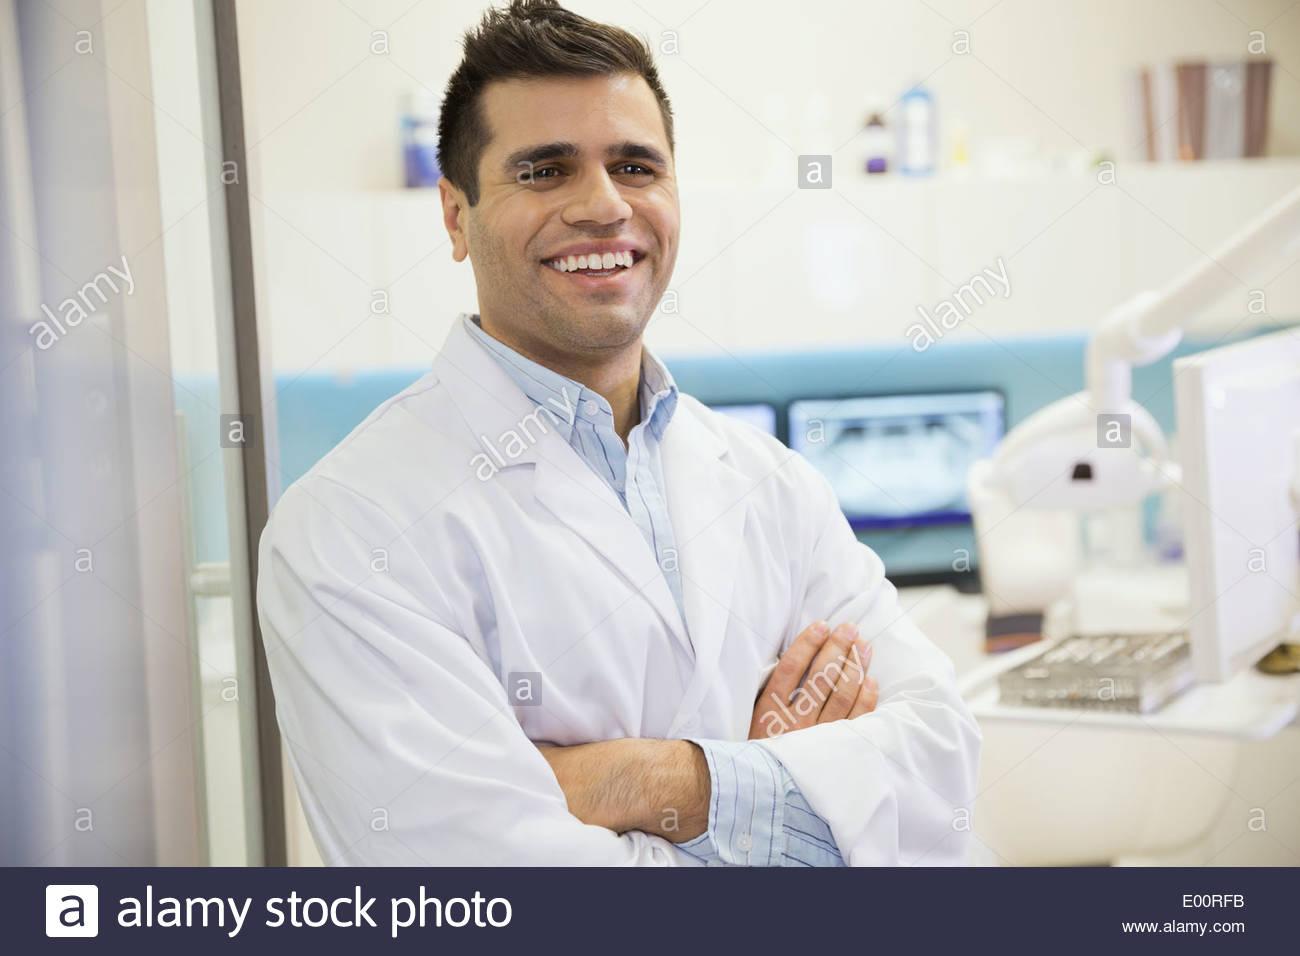 Dentist laughing in doorway of office - Stock Image